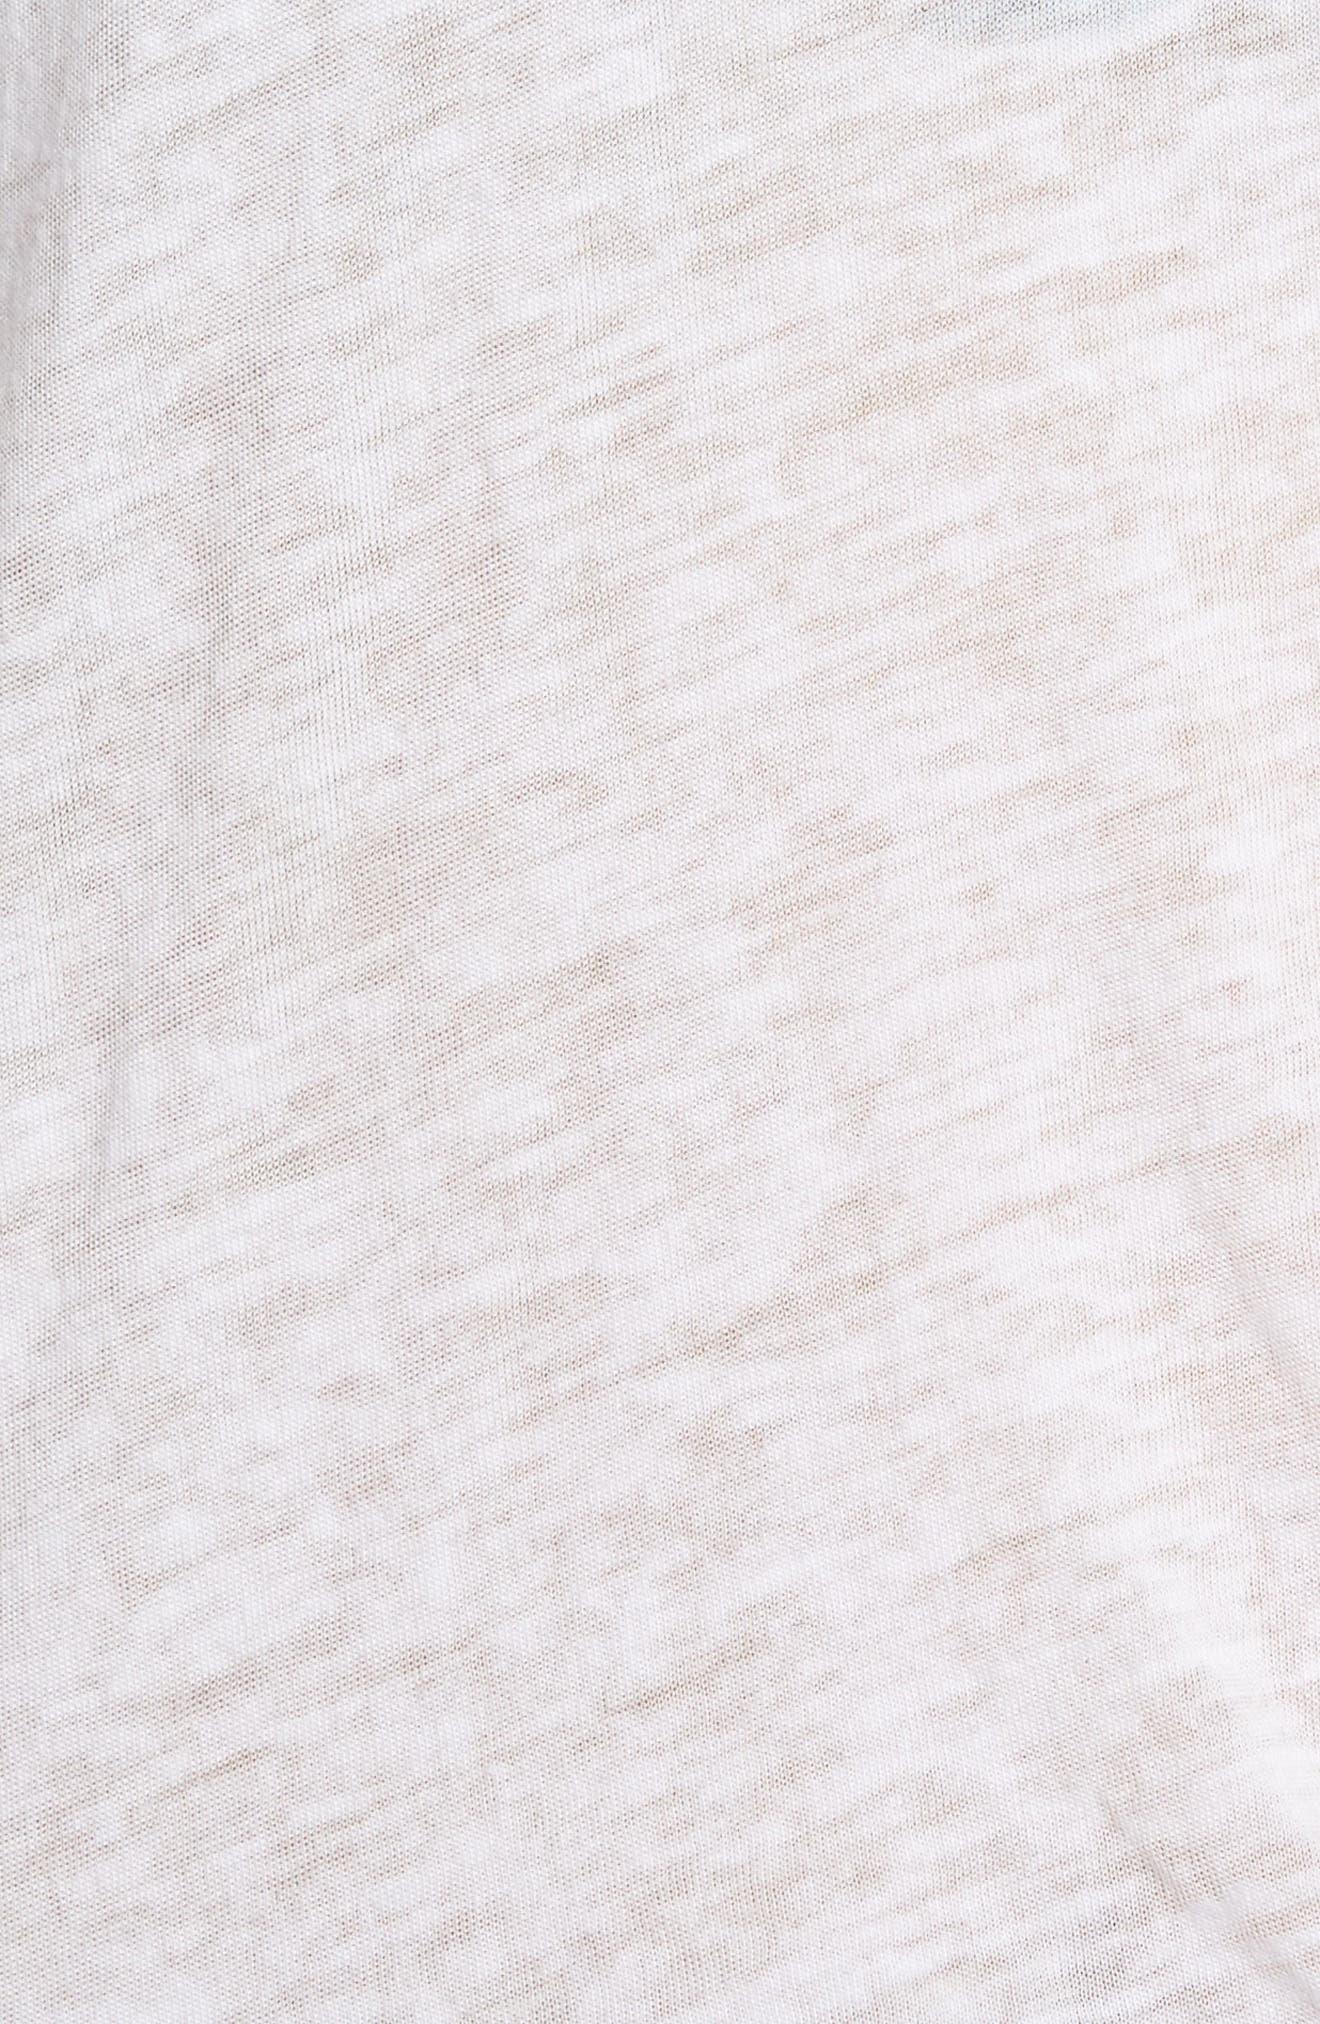 France Tie Hem Graphic Tee,                             Alternate thumbnail 5, color,                             White